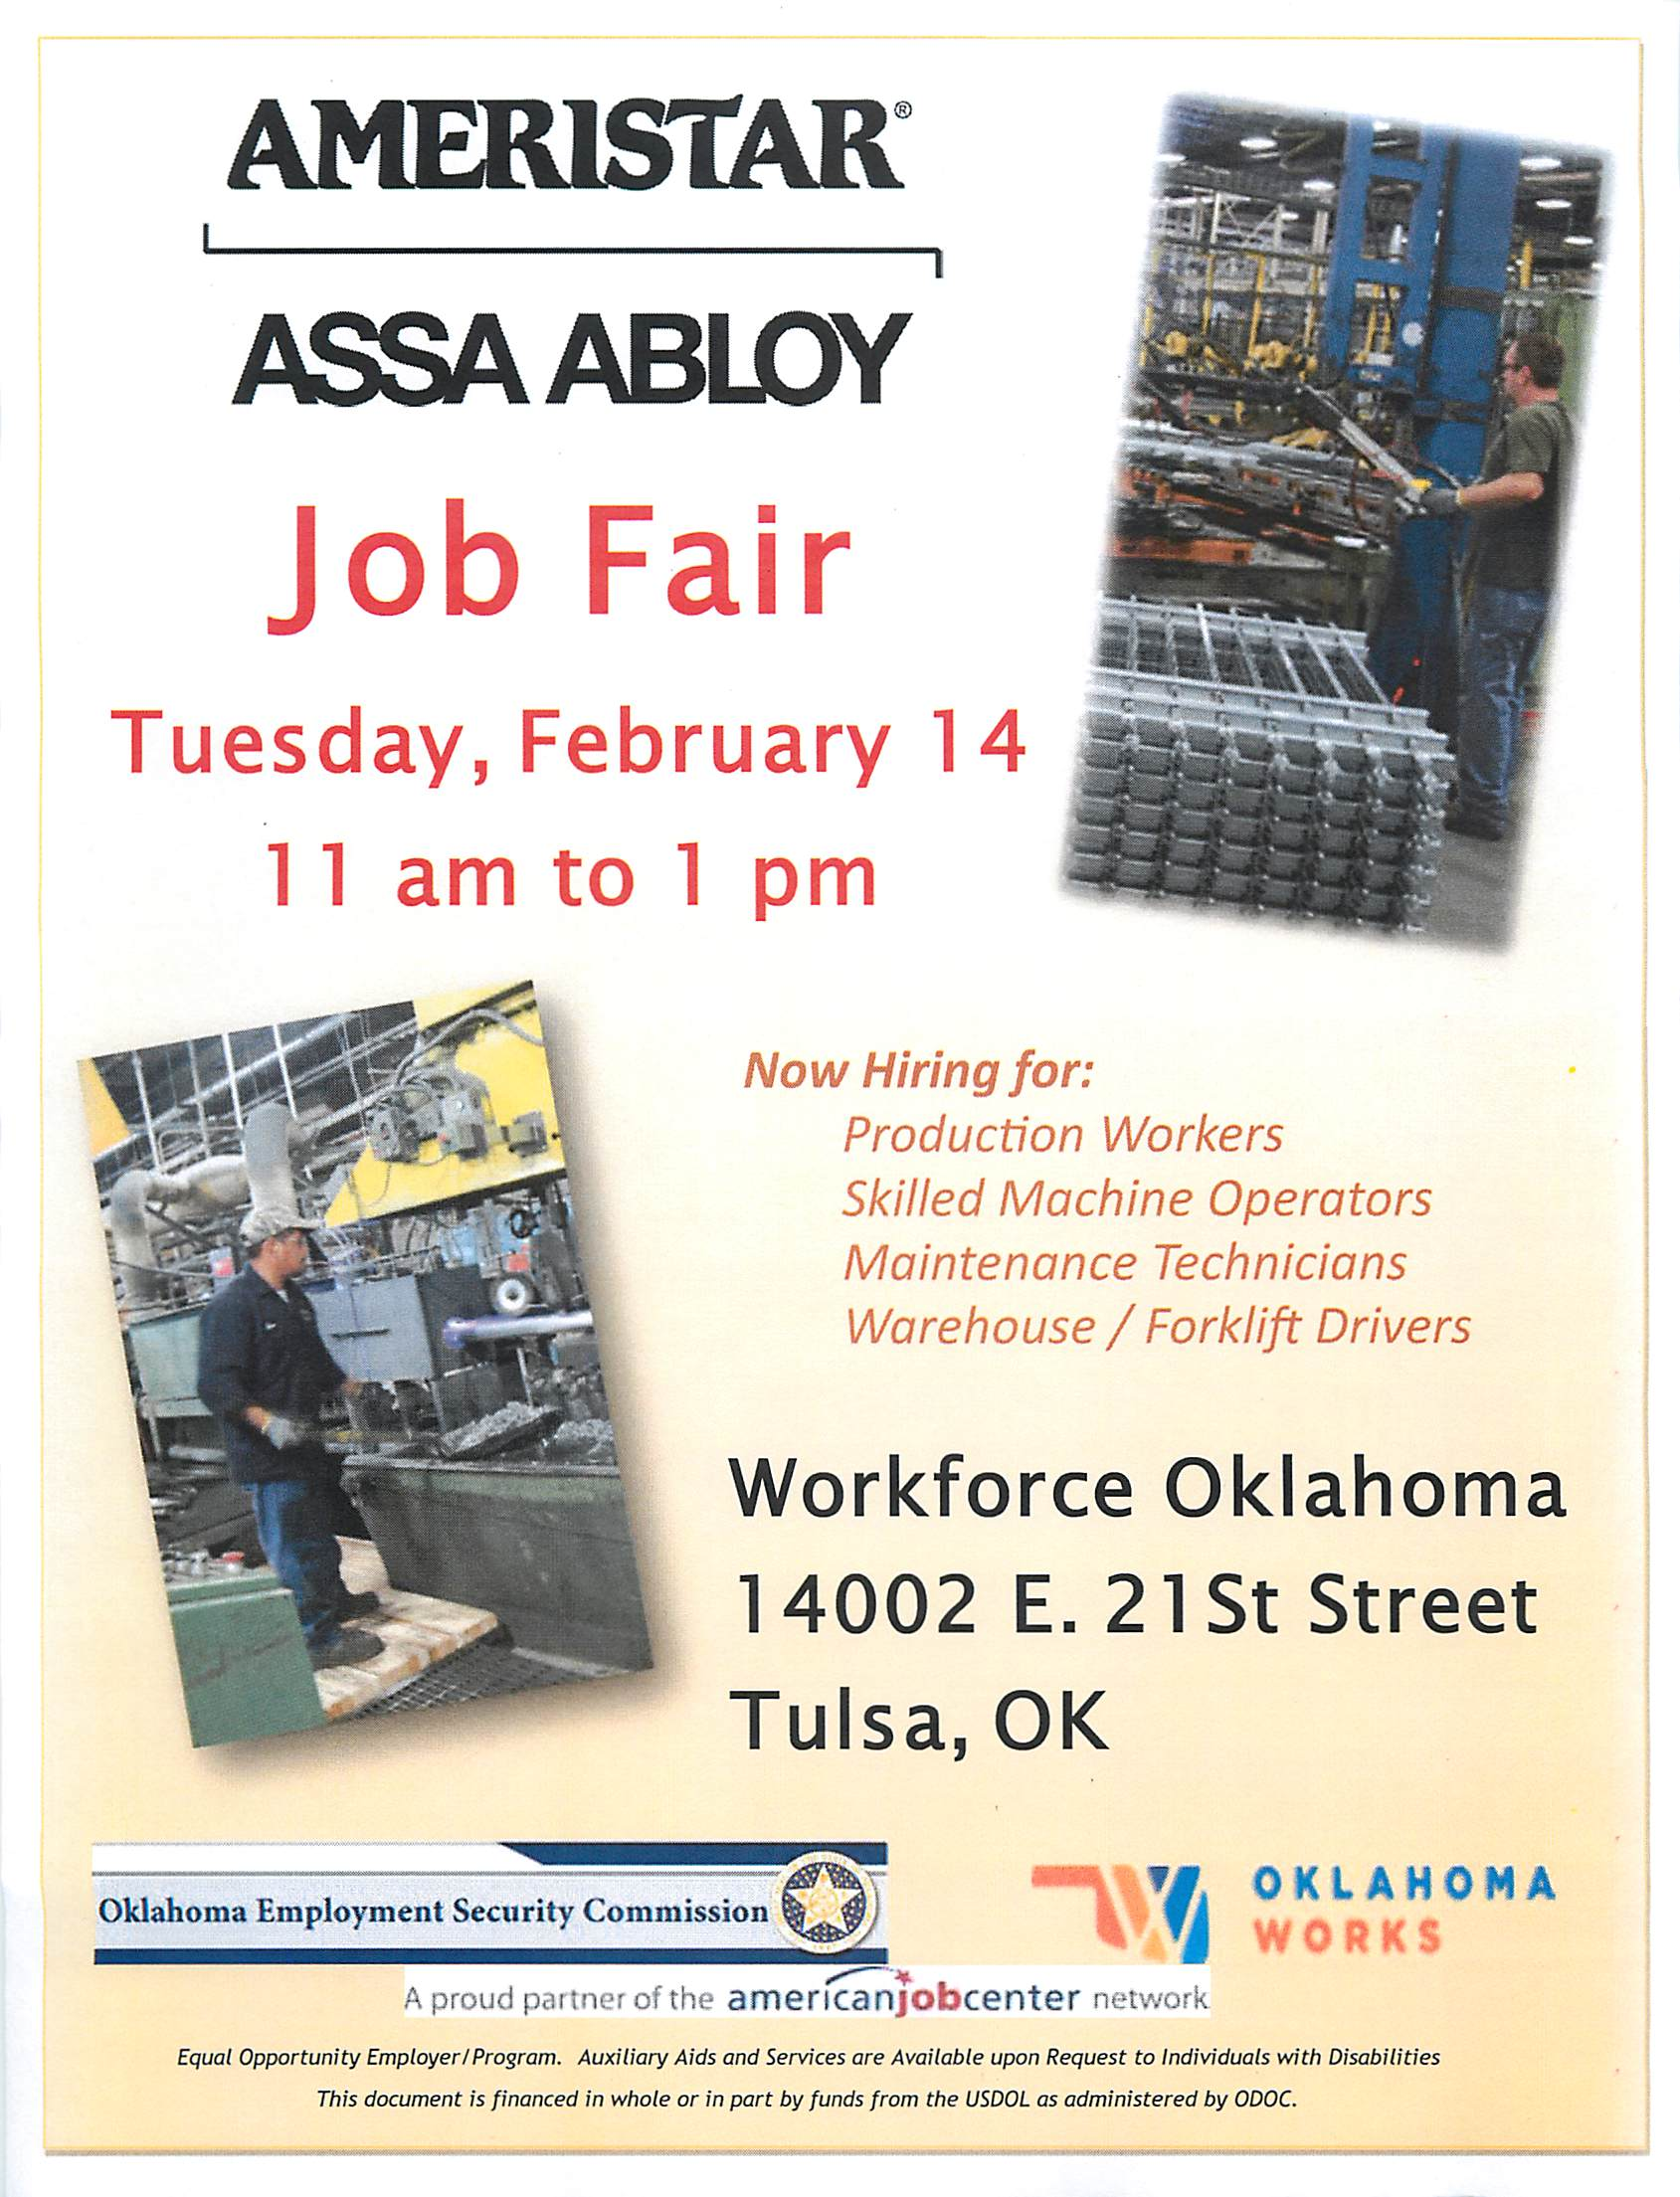 Oklahoma employment security commission tulsa